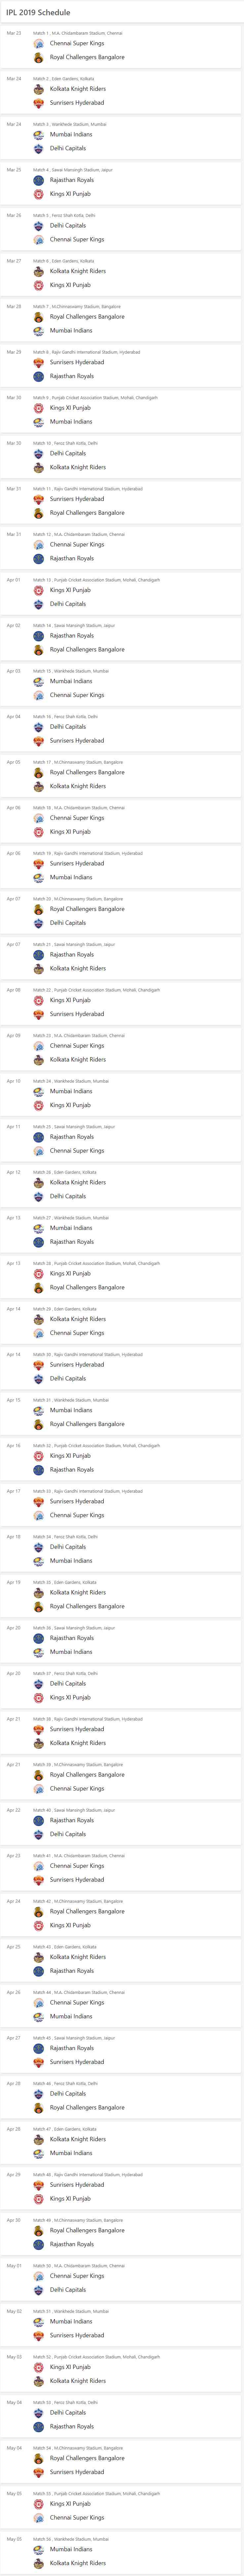 Vivo IPL 2019 Full Schedule